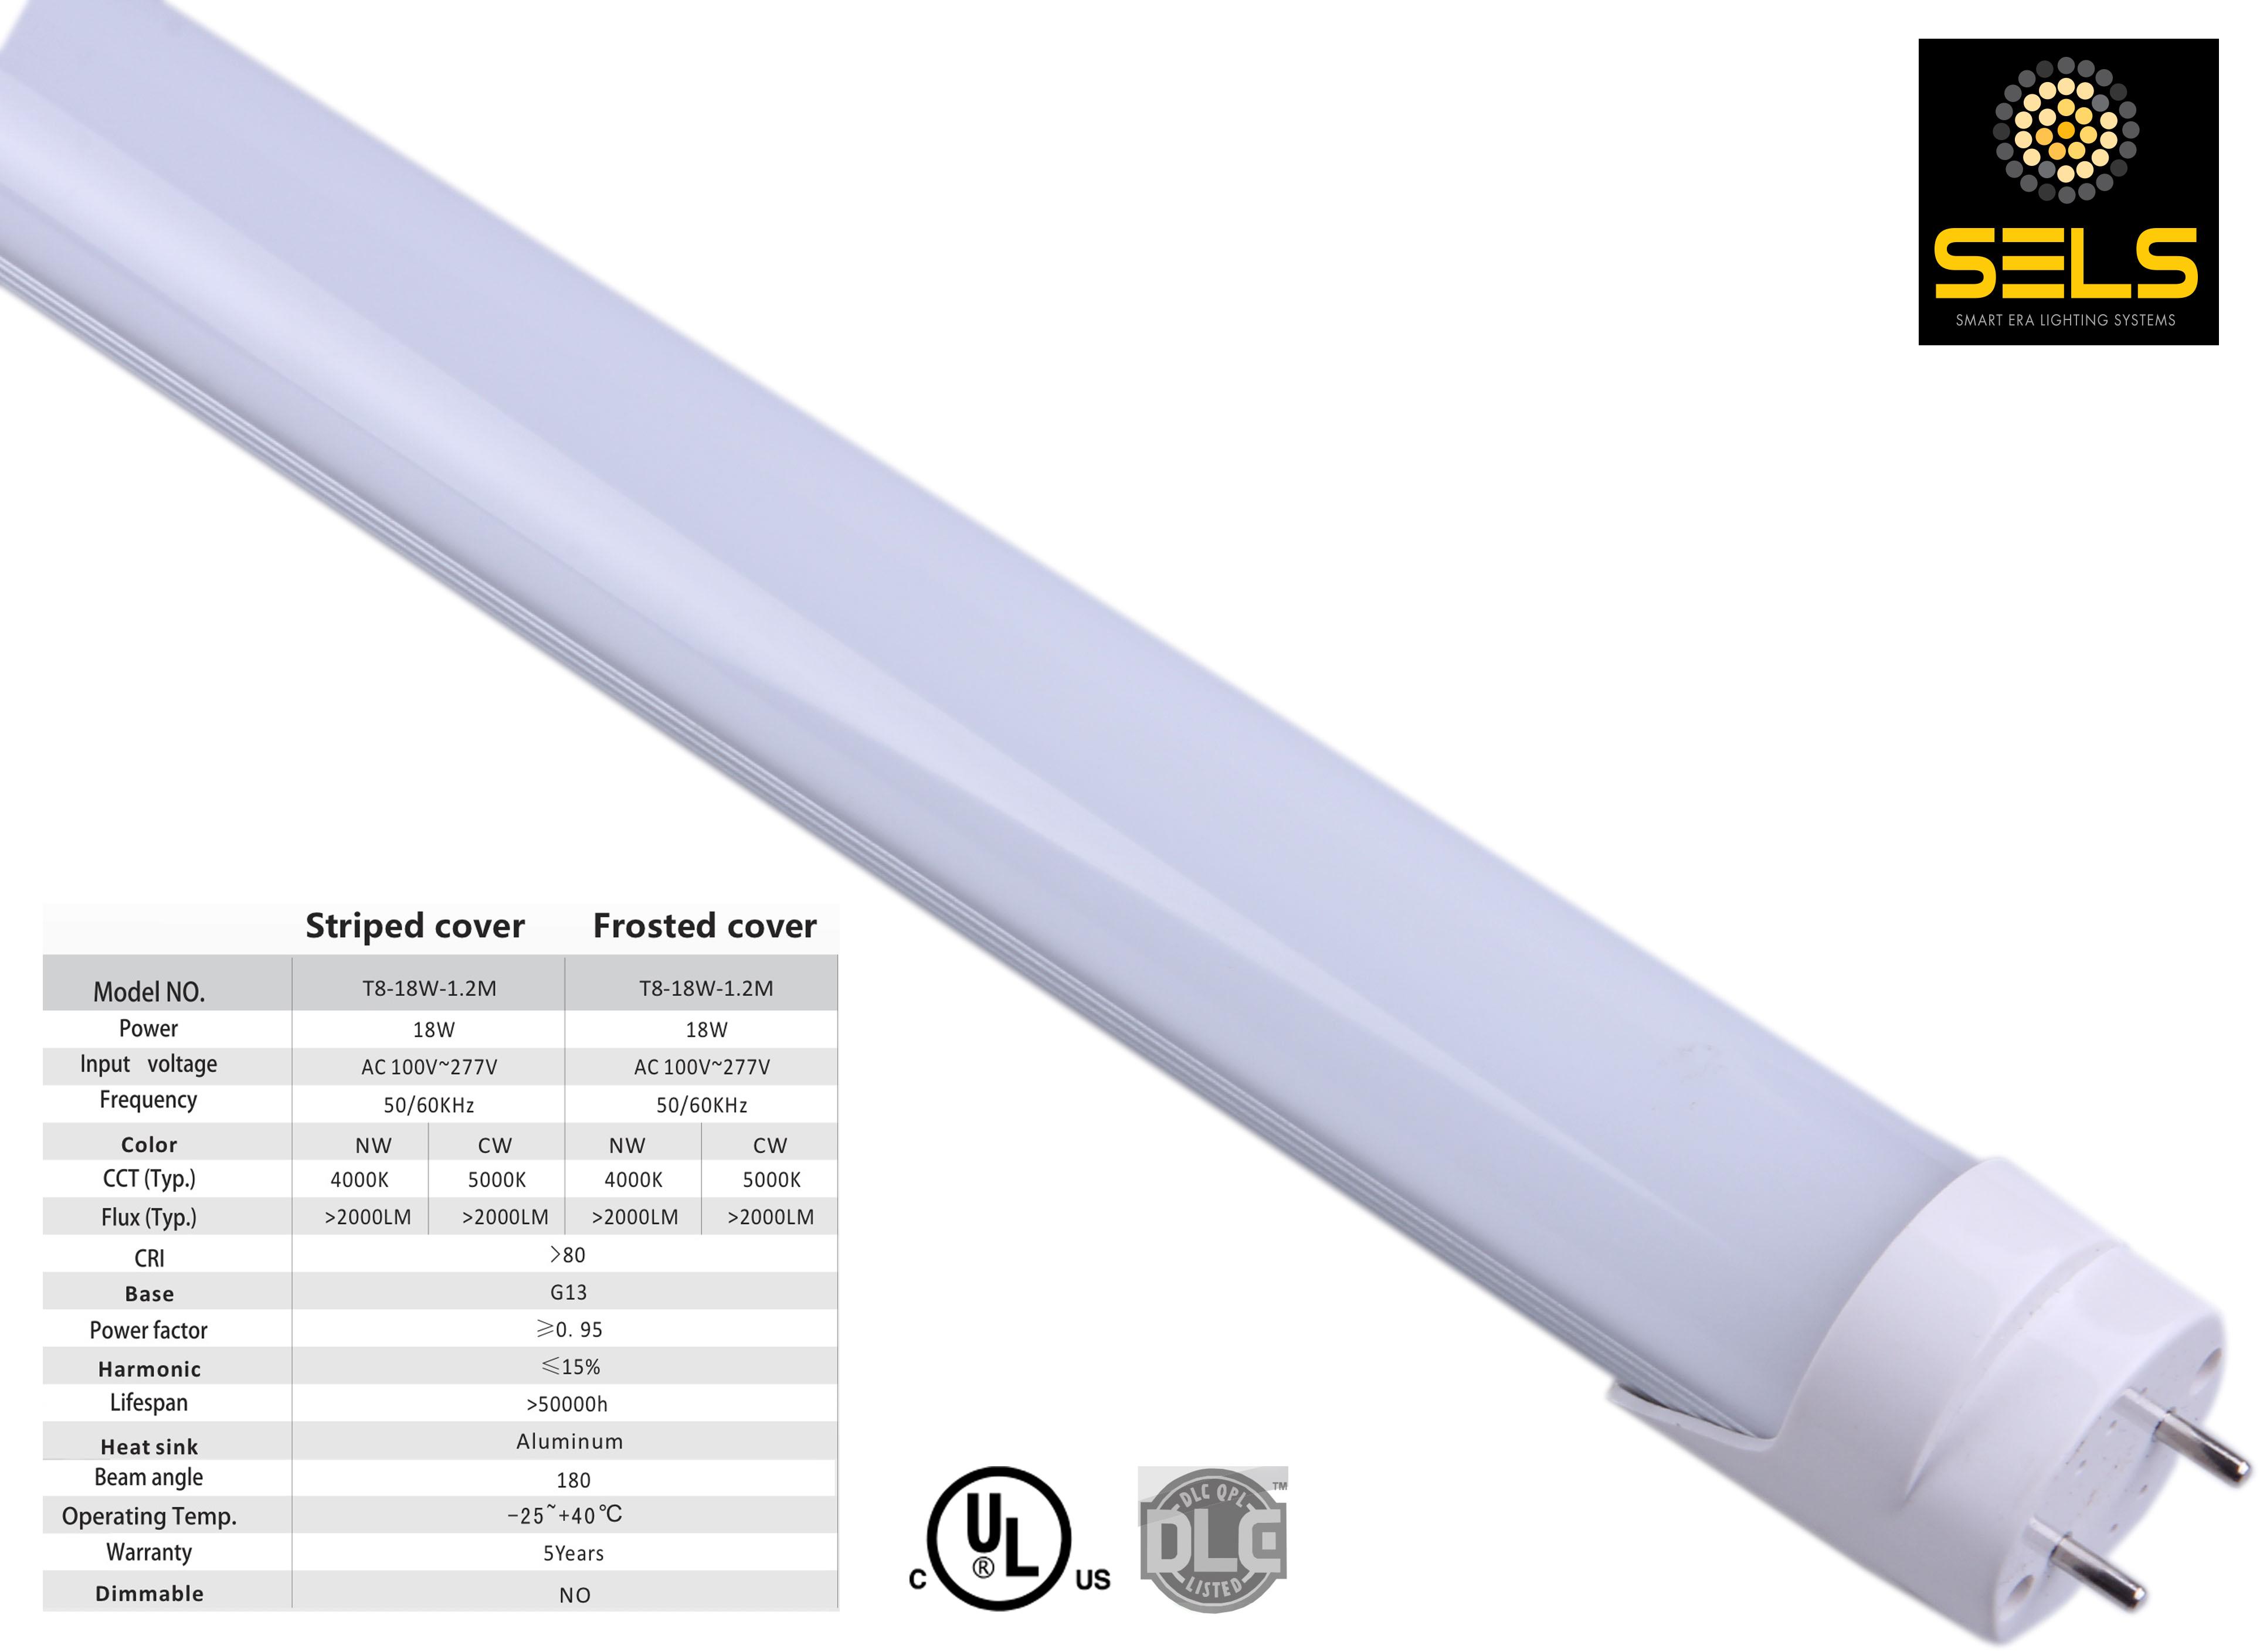 sels led tube 18 watts 4 ft t8 t12 fluorescent tube. Black Bedroom Furniture Sets. Home Design Ideas